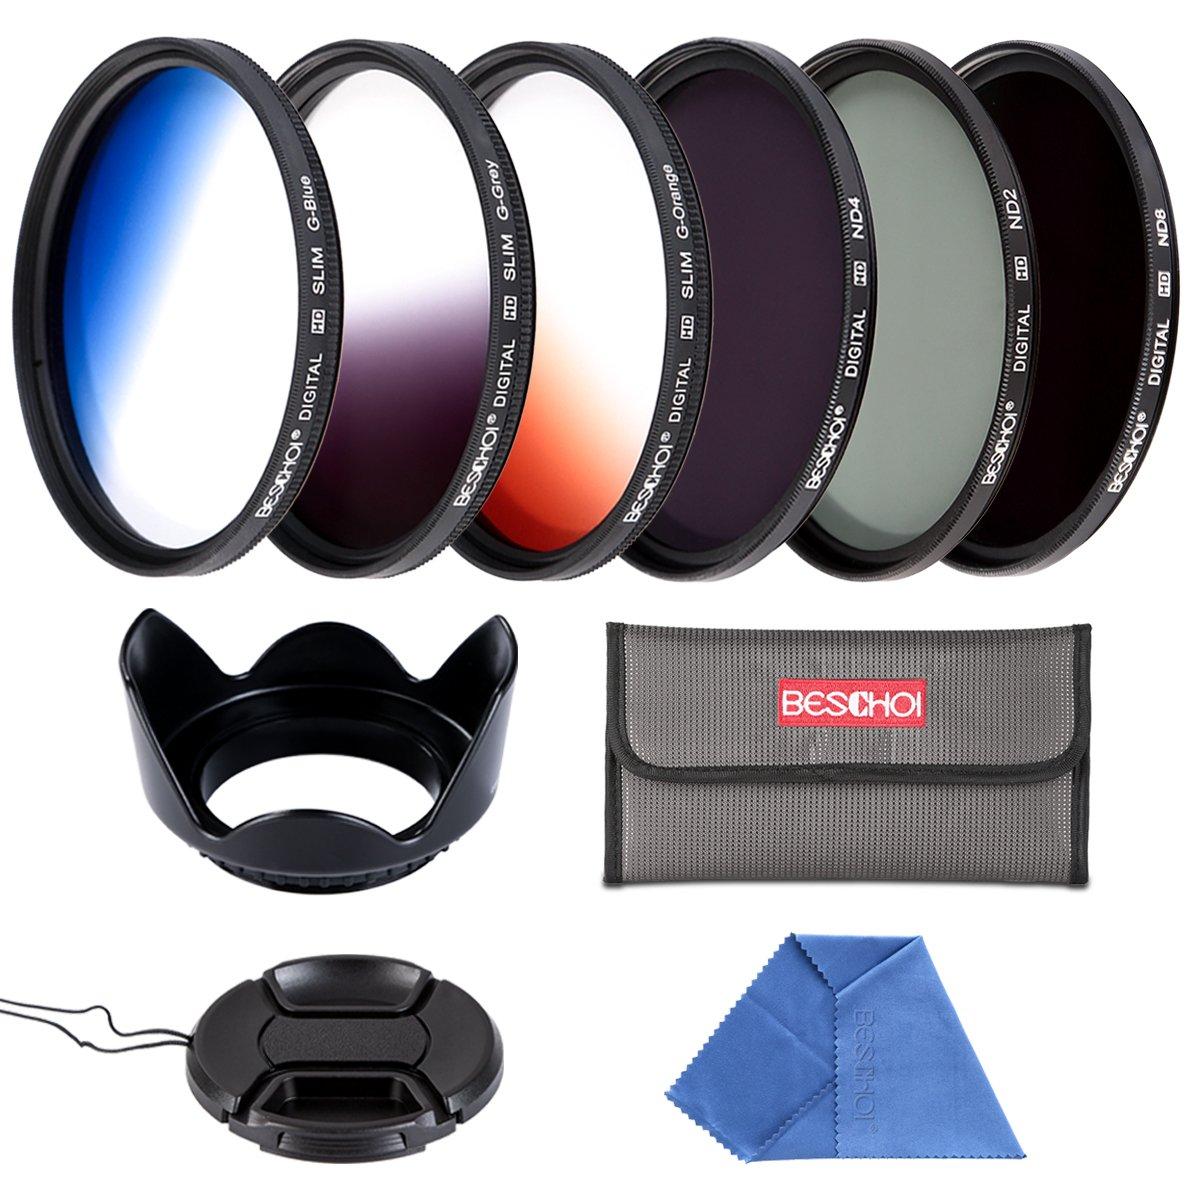 Beschoi 58mm 6pcs High-Precision Slim Neutral Density Filter Lens Filter Kit ( UV + FLD + ND4 ) + Graduated Color Filter for Nikon Canon DSLR Cameras with Lens Hood + Lens Cap + Filter Pouch